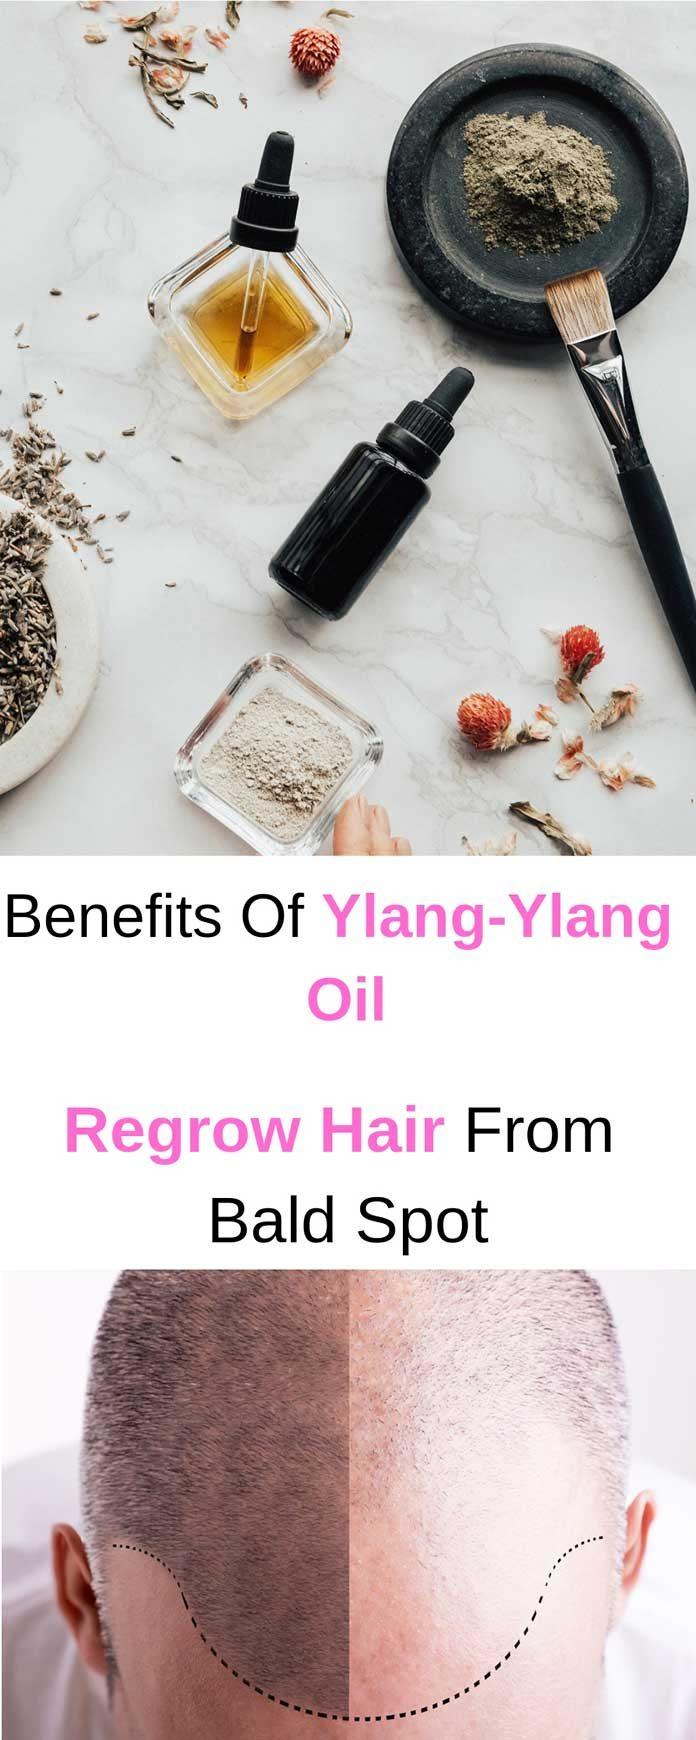 benefits of ylang ylang oil for hair growth